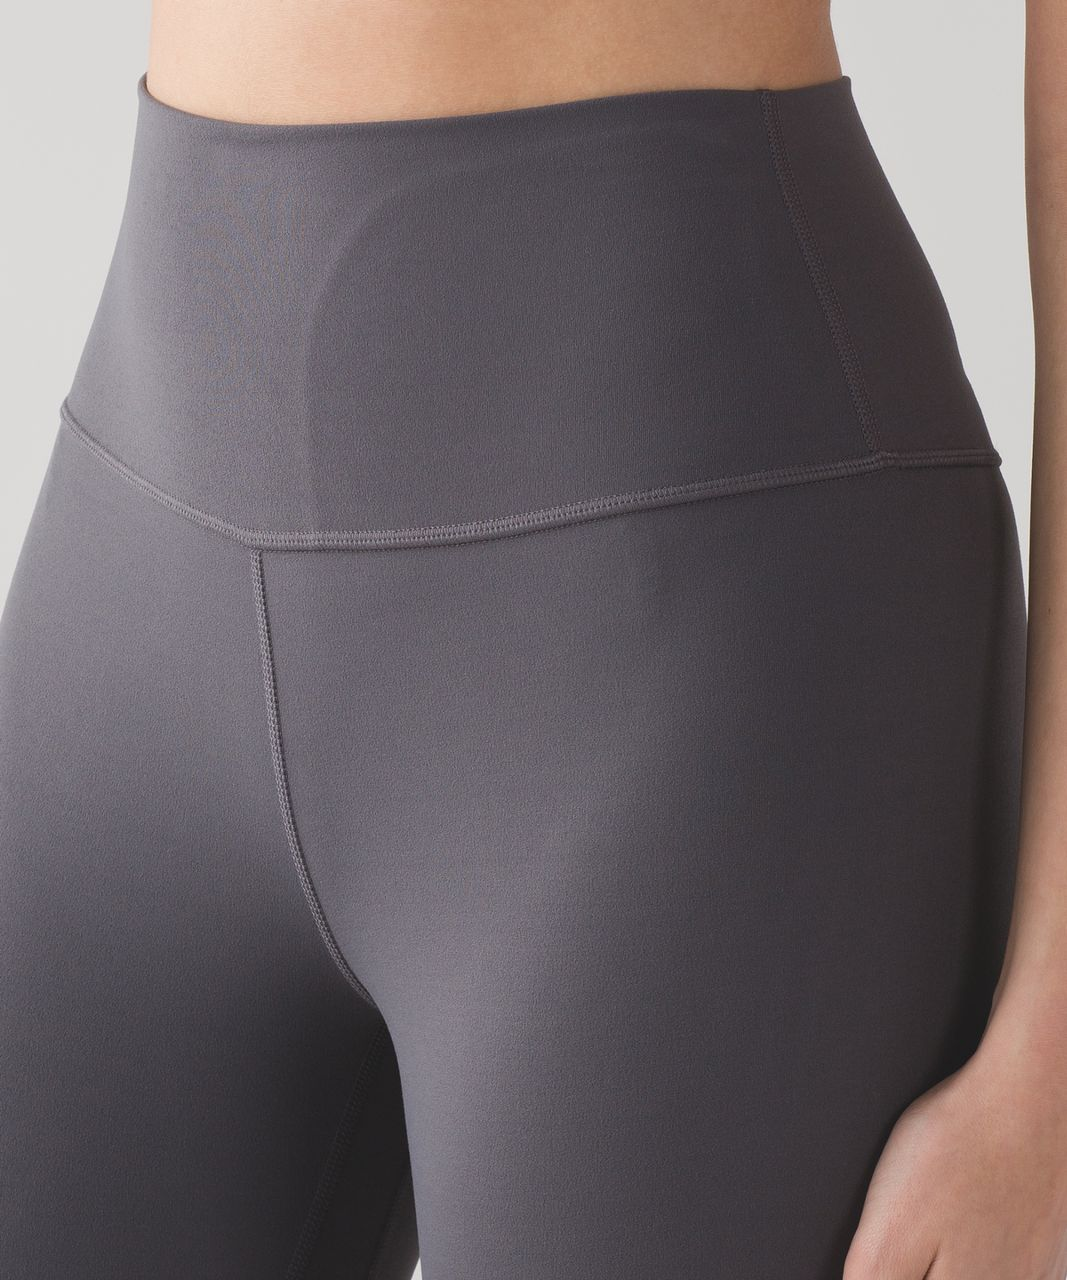 Lululemon Align Pant II - Dark Carbon